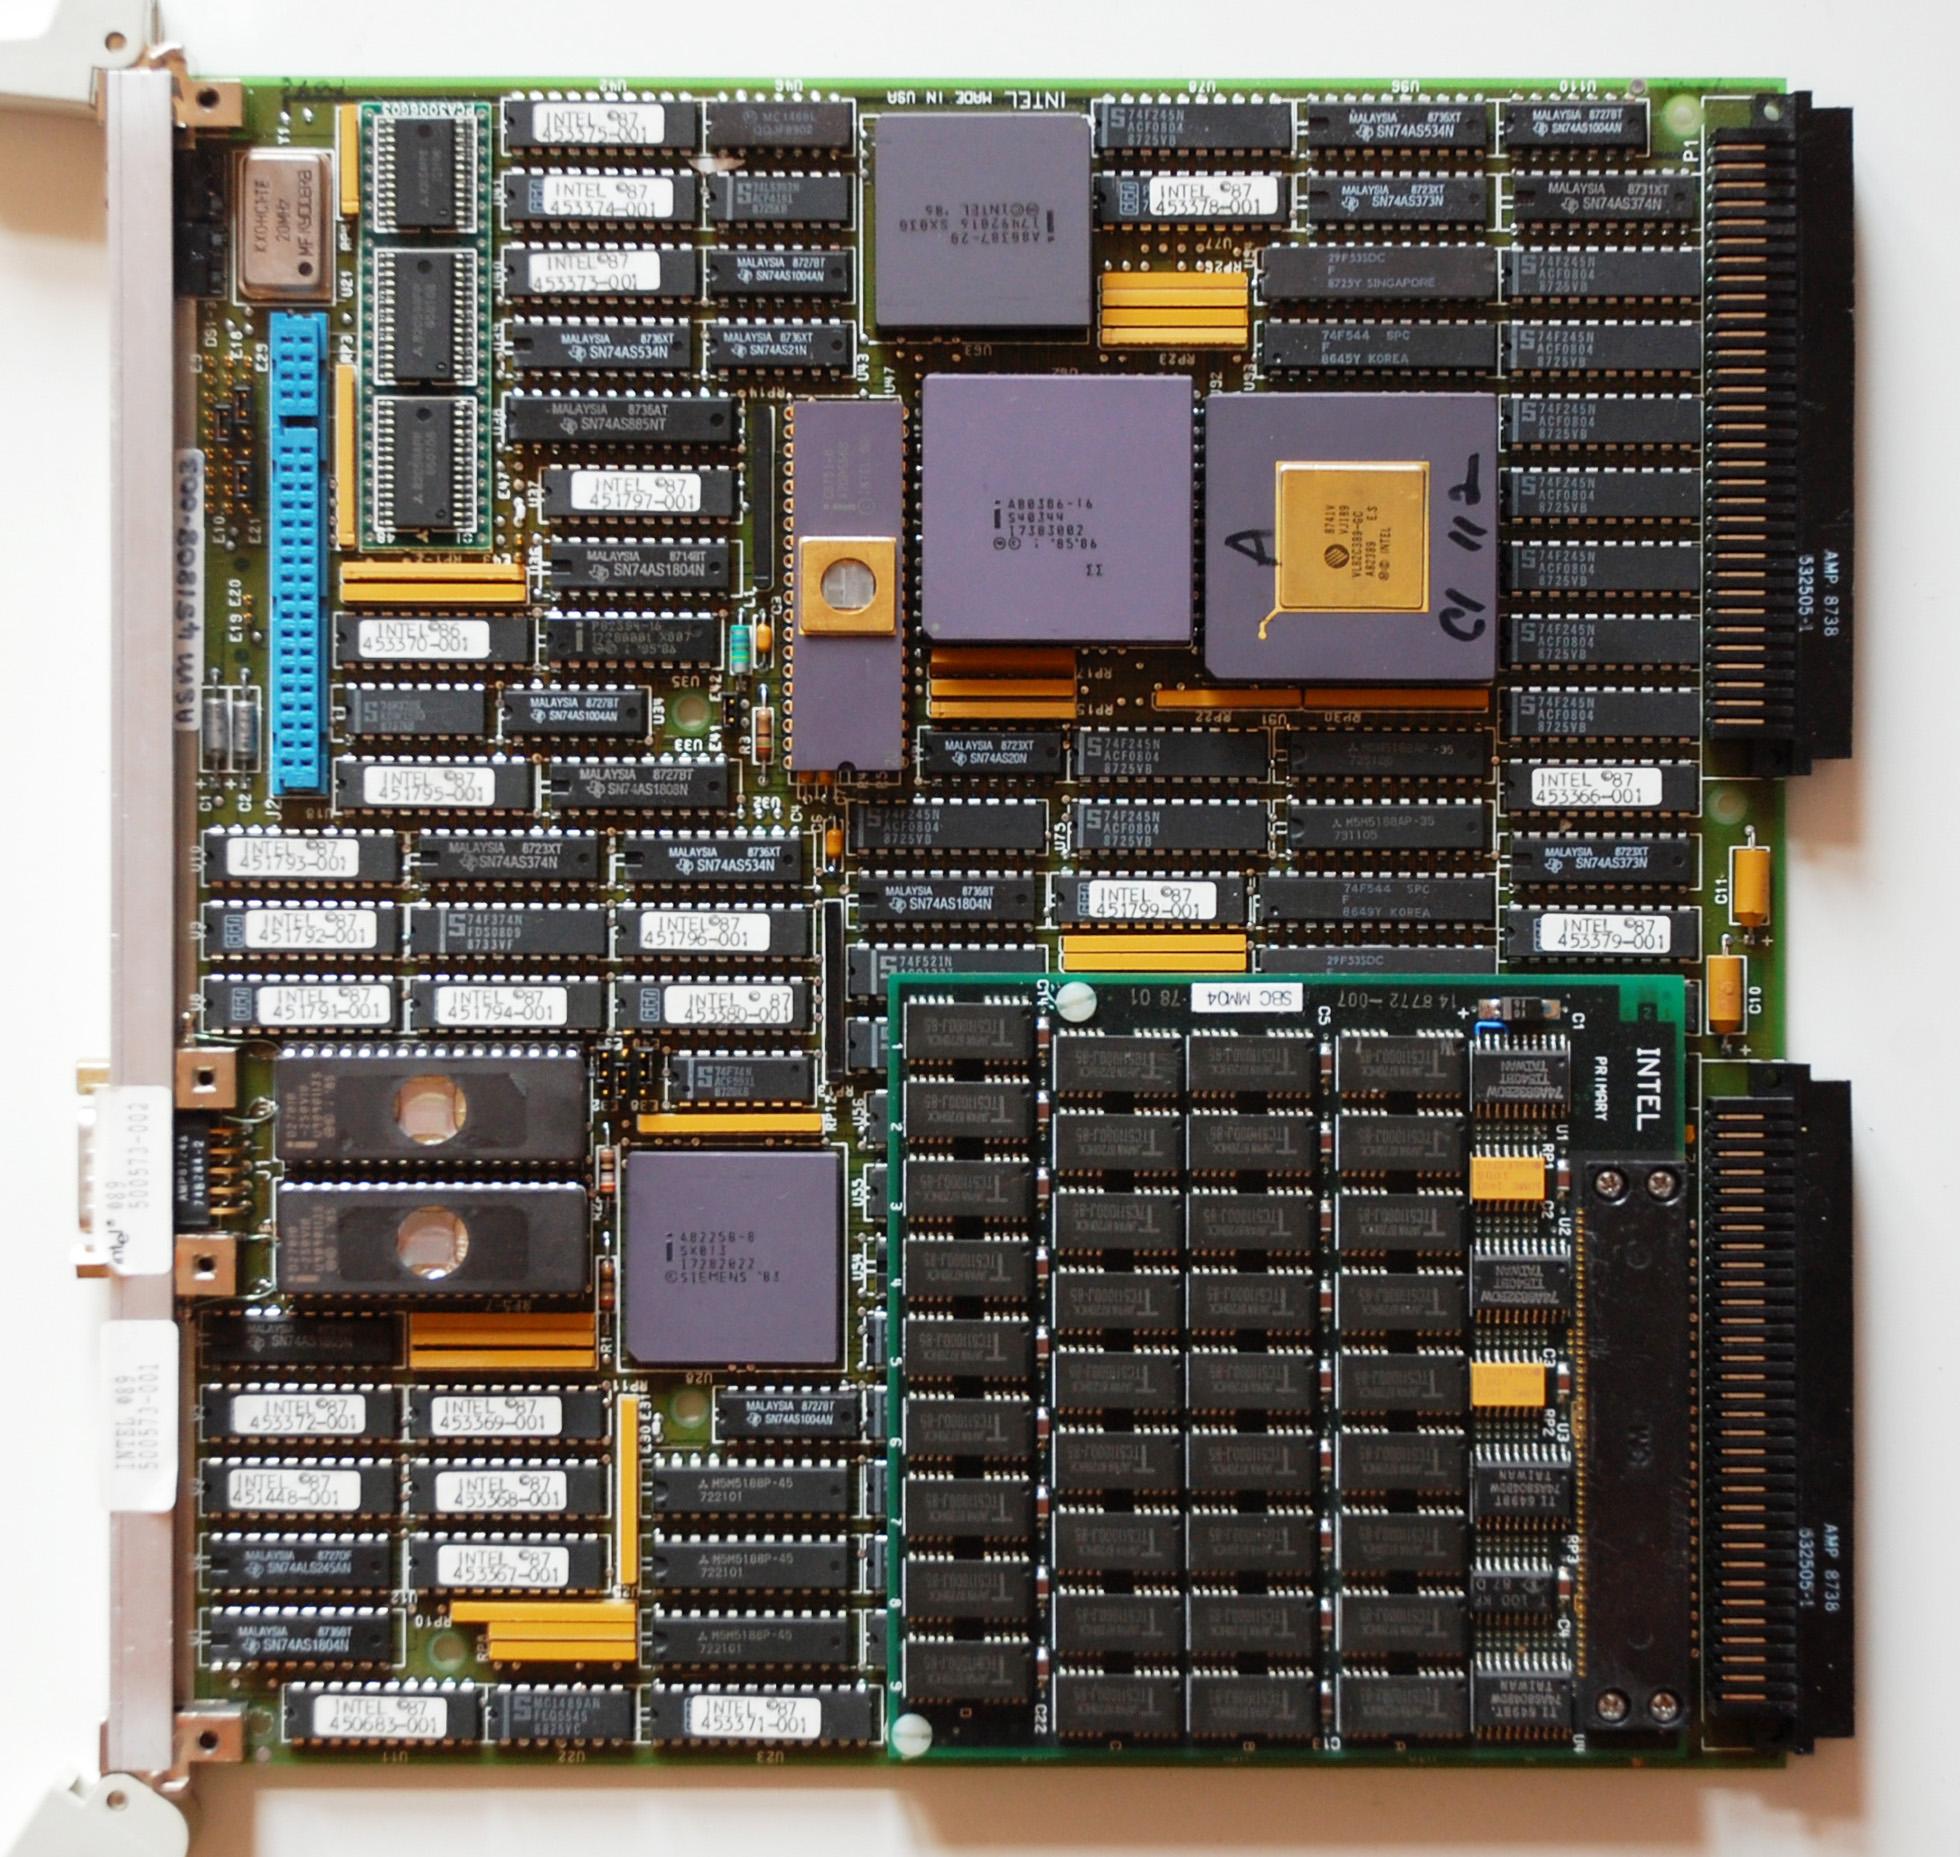 File:Intel iSBC 386 116 Multibus II Single Bus Computer.JPG